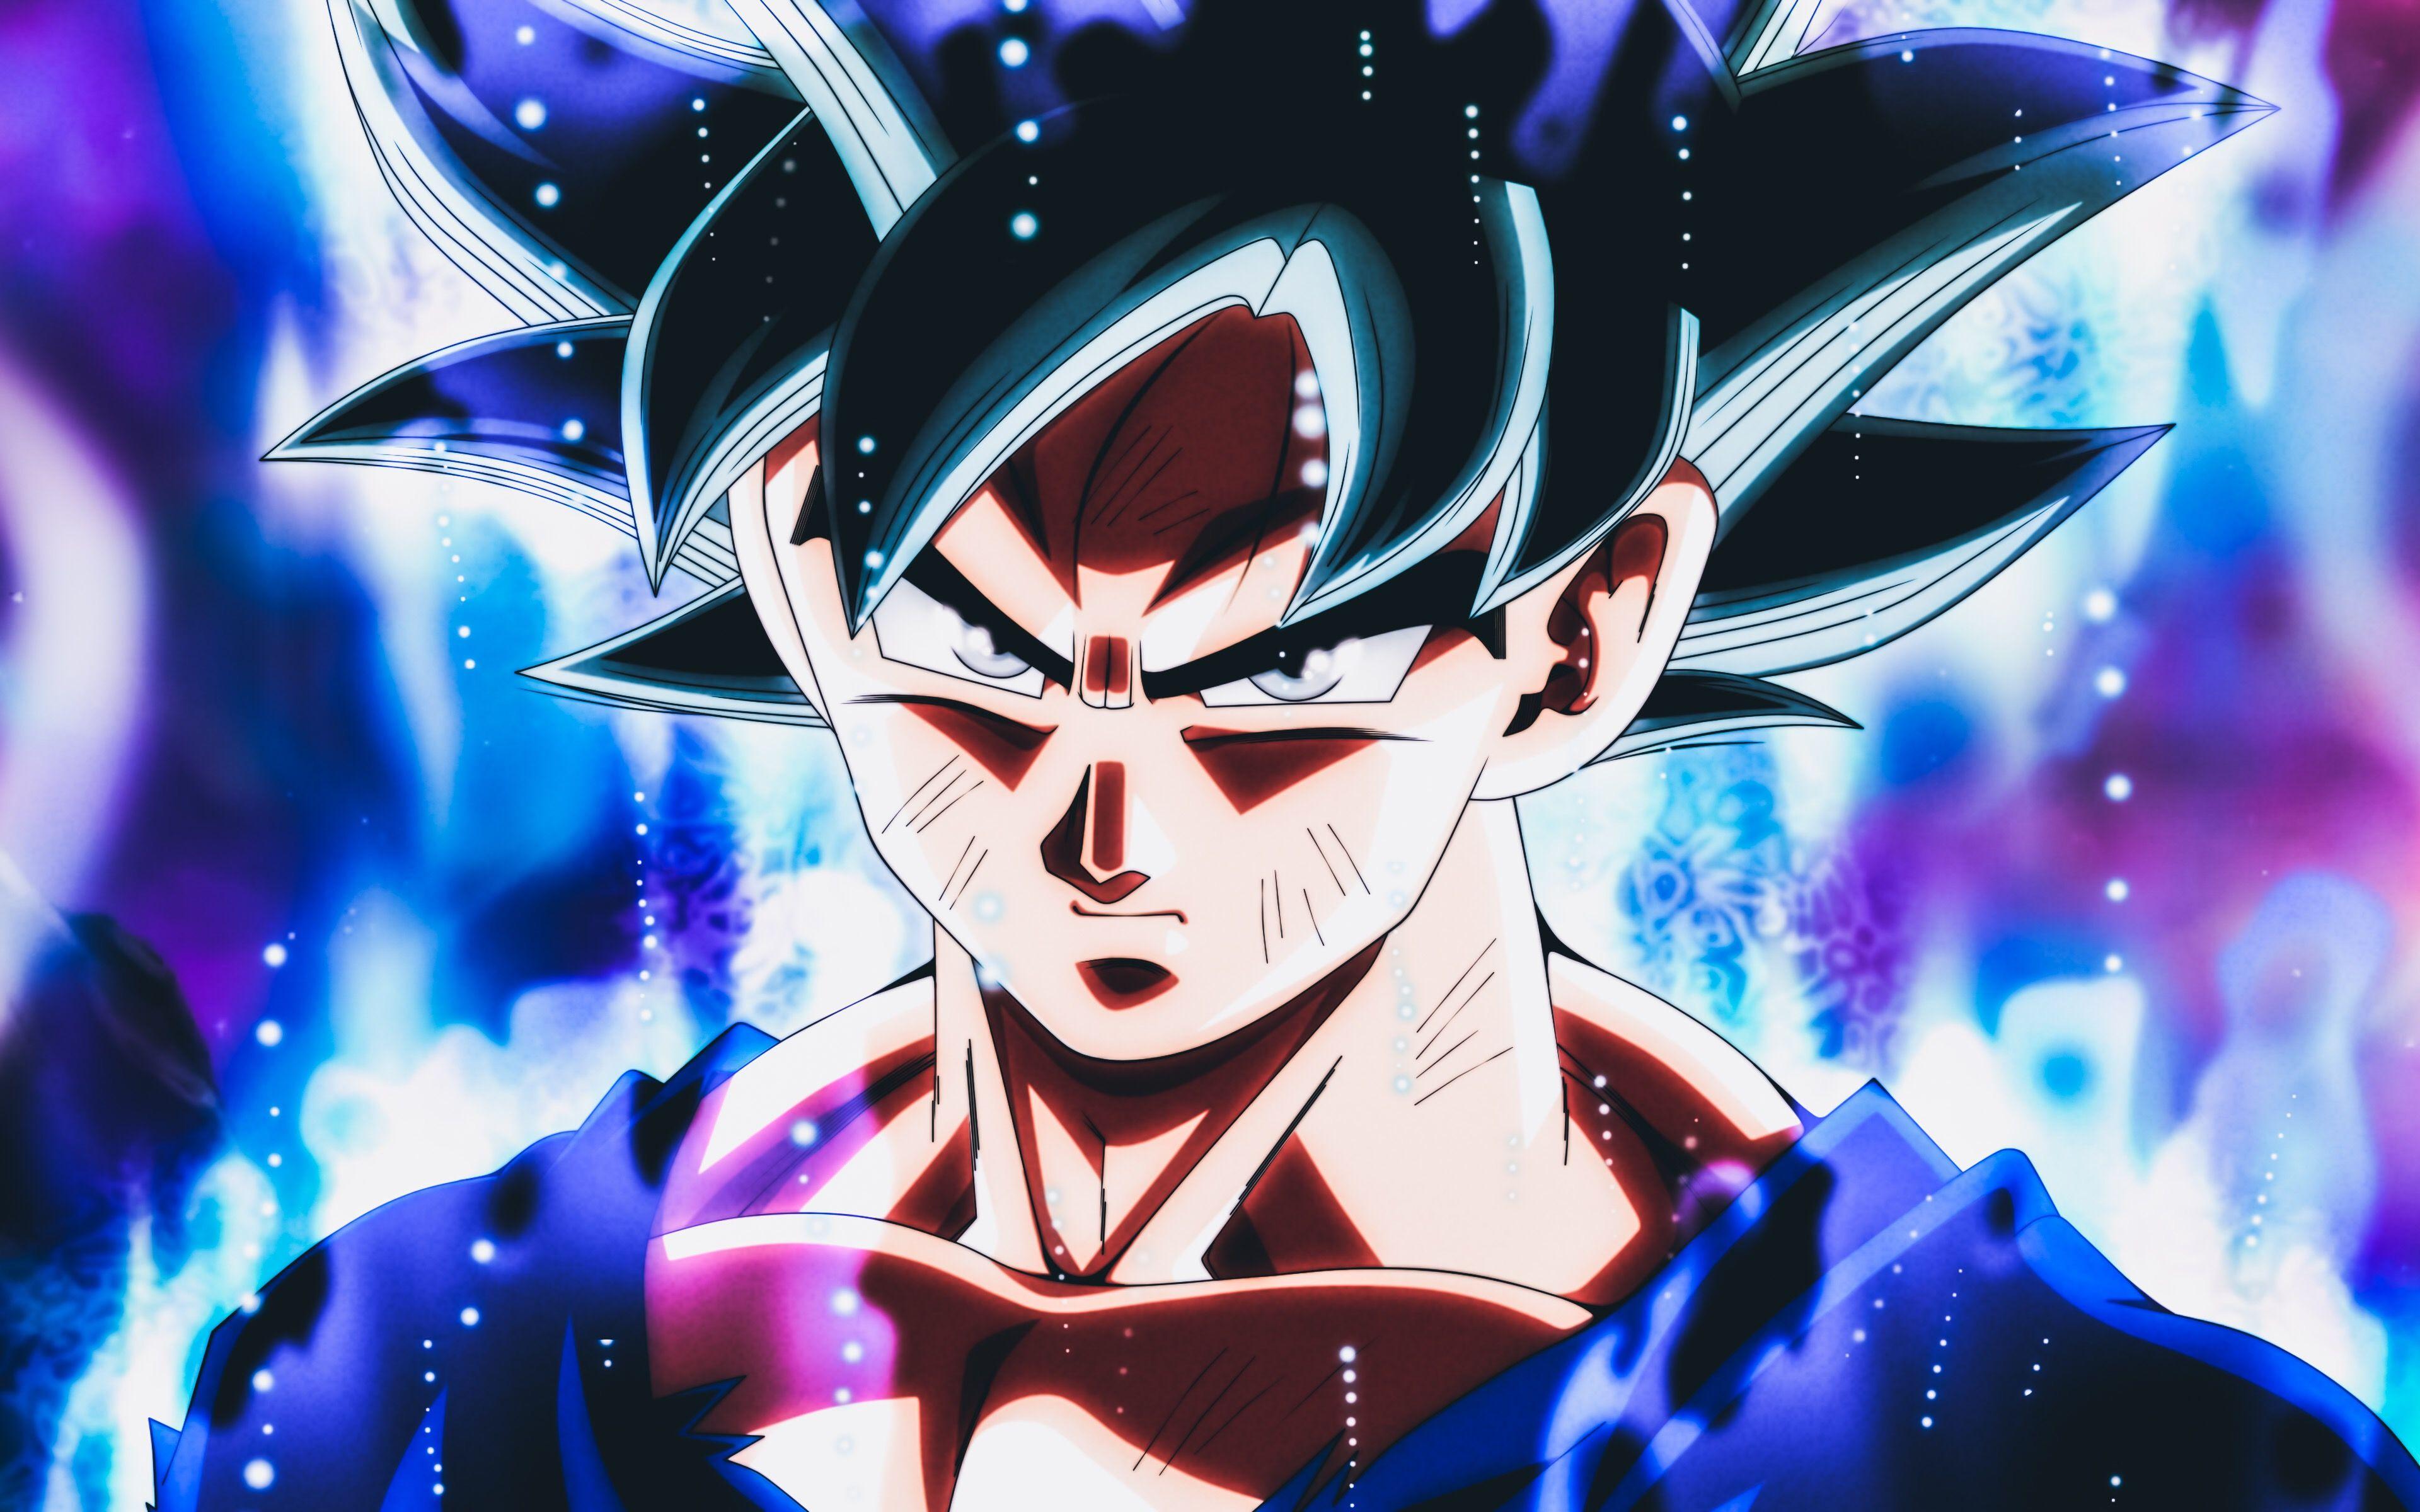 Goku Ultra Instinct 4k Dragon Ball Z Iphone Wallpaper Anime Dragon Ball Super Dragon Ball Super Goku